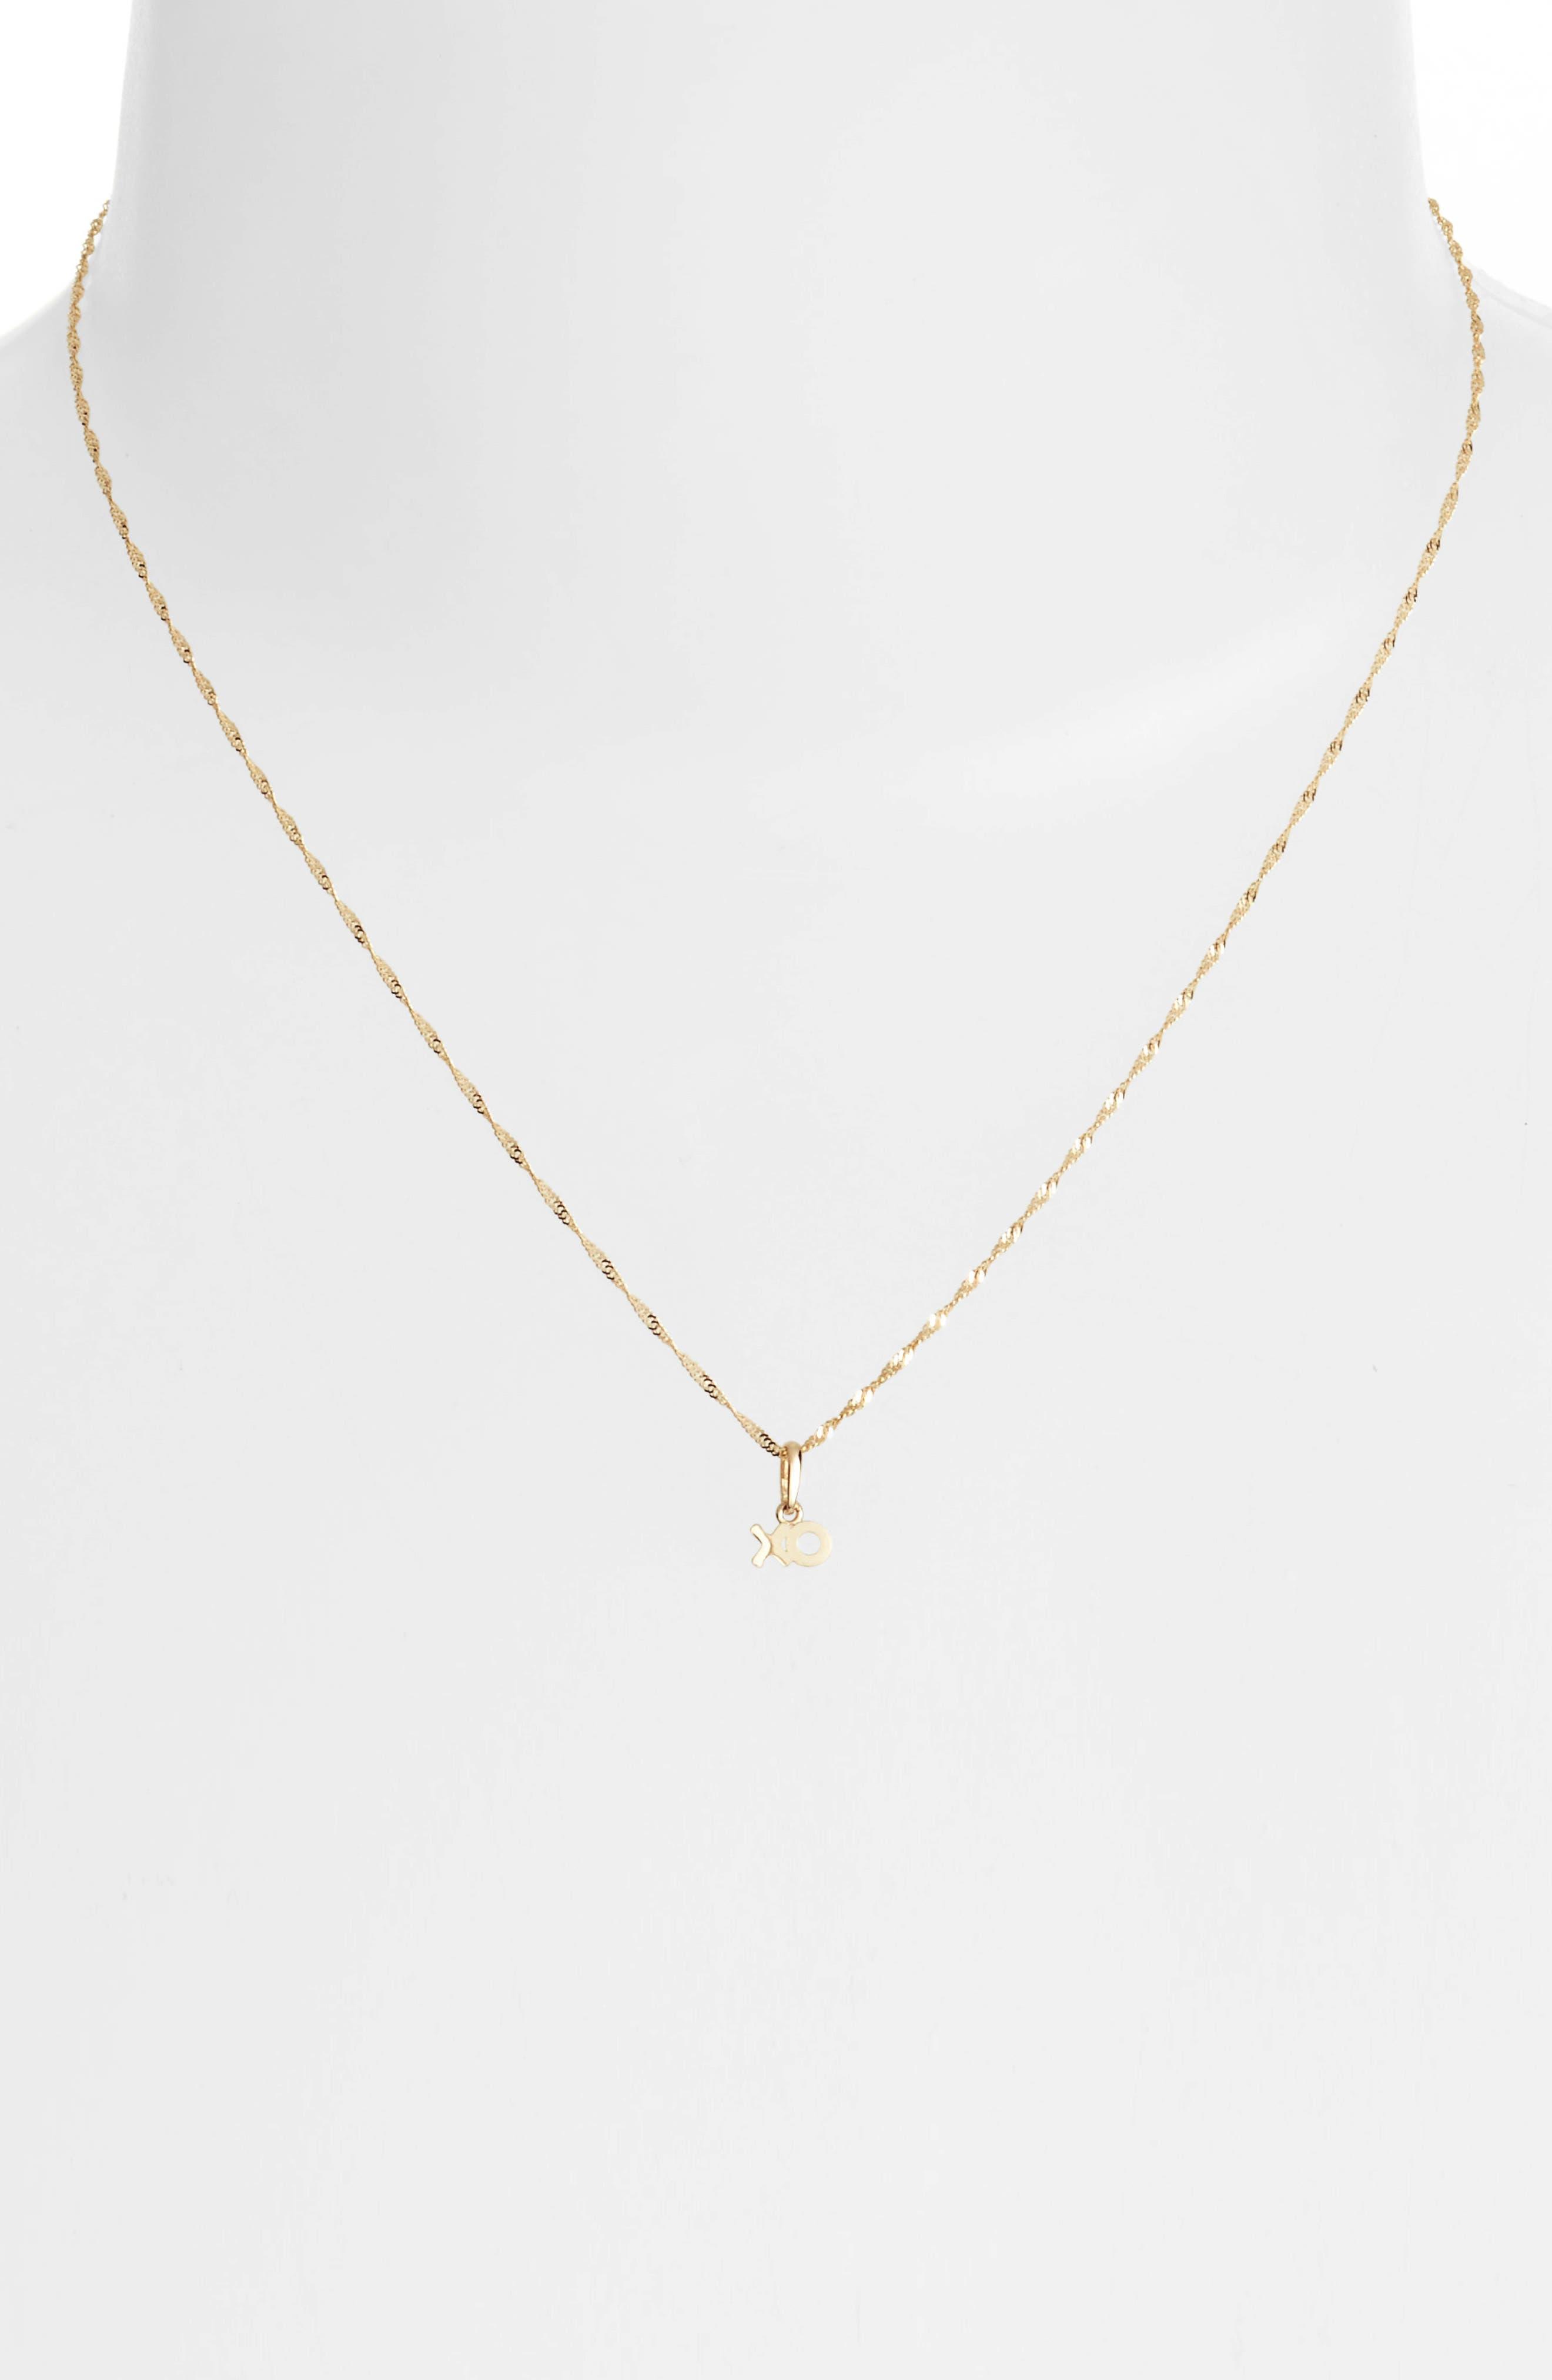 XO Charm Short Pendant Necklace,                             Alternate thumbnail 2, color,                             Yellow Gold